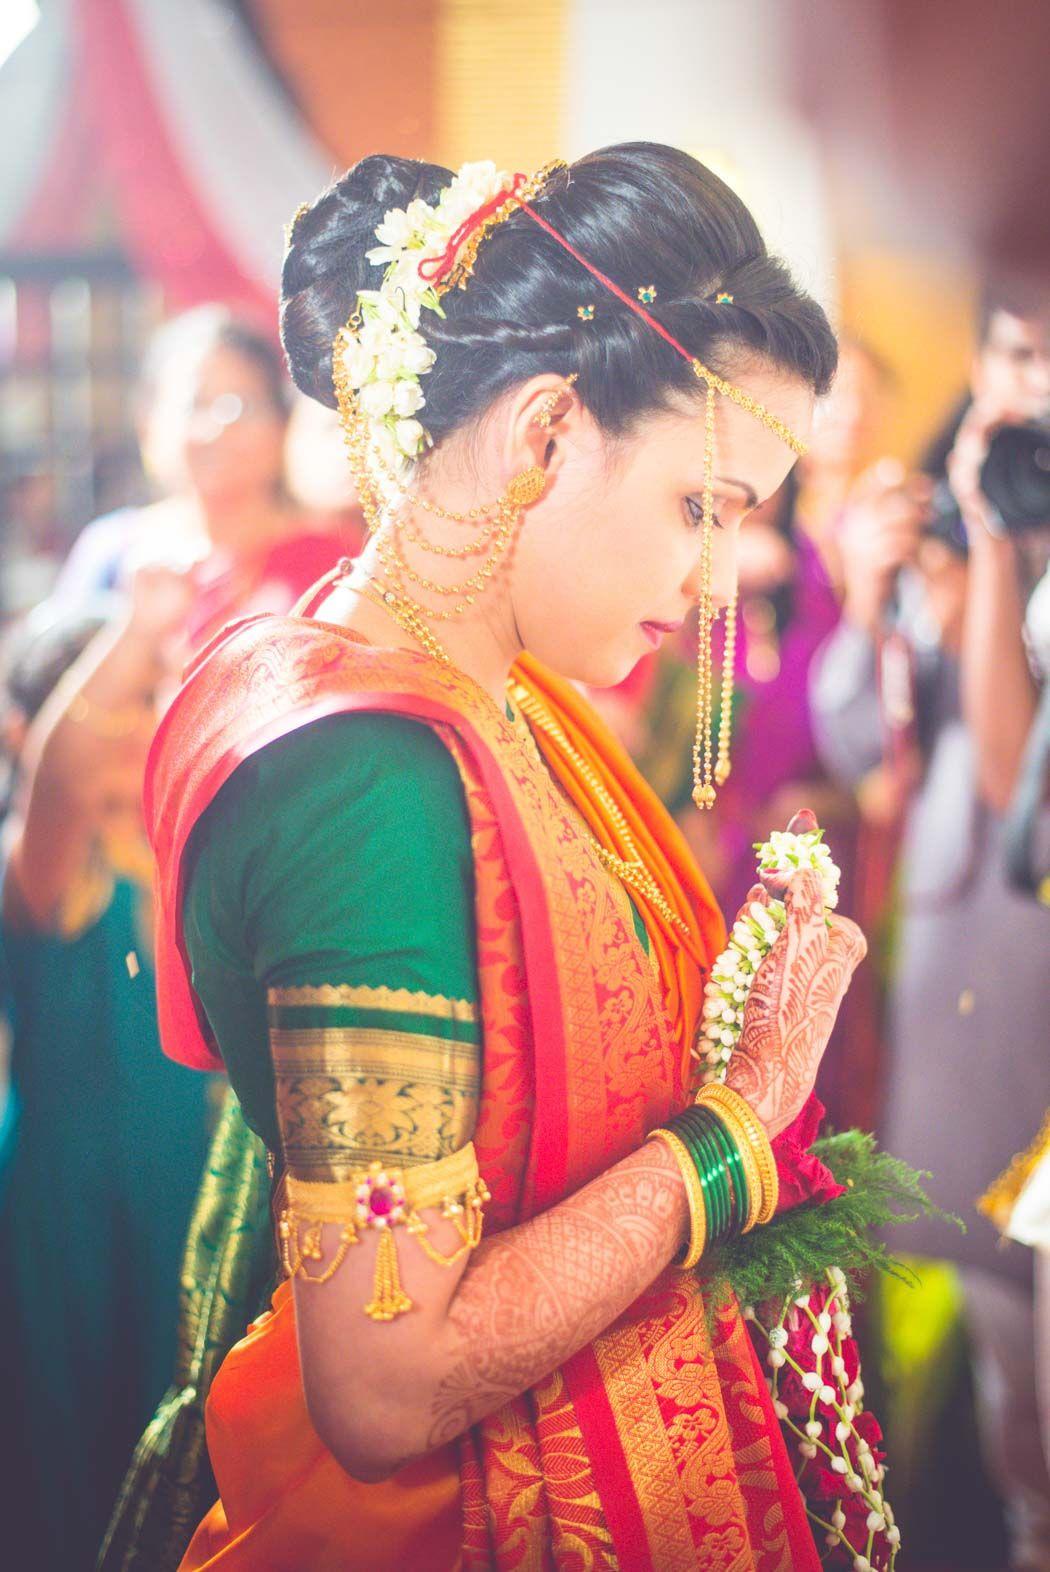 Stunning marathi bride in orange red and green ew in